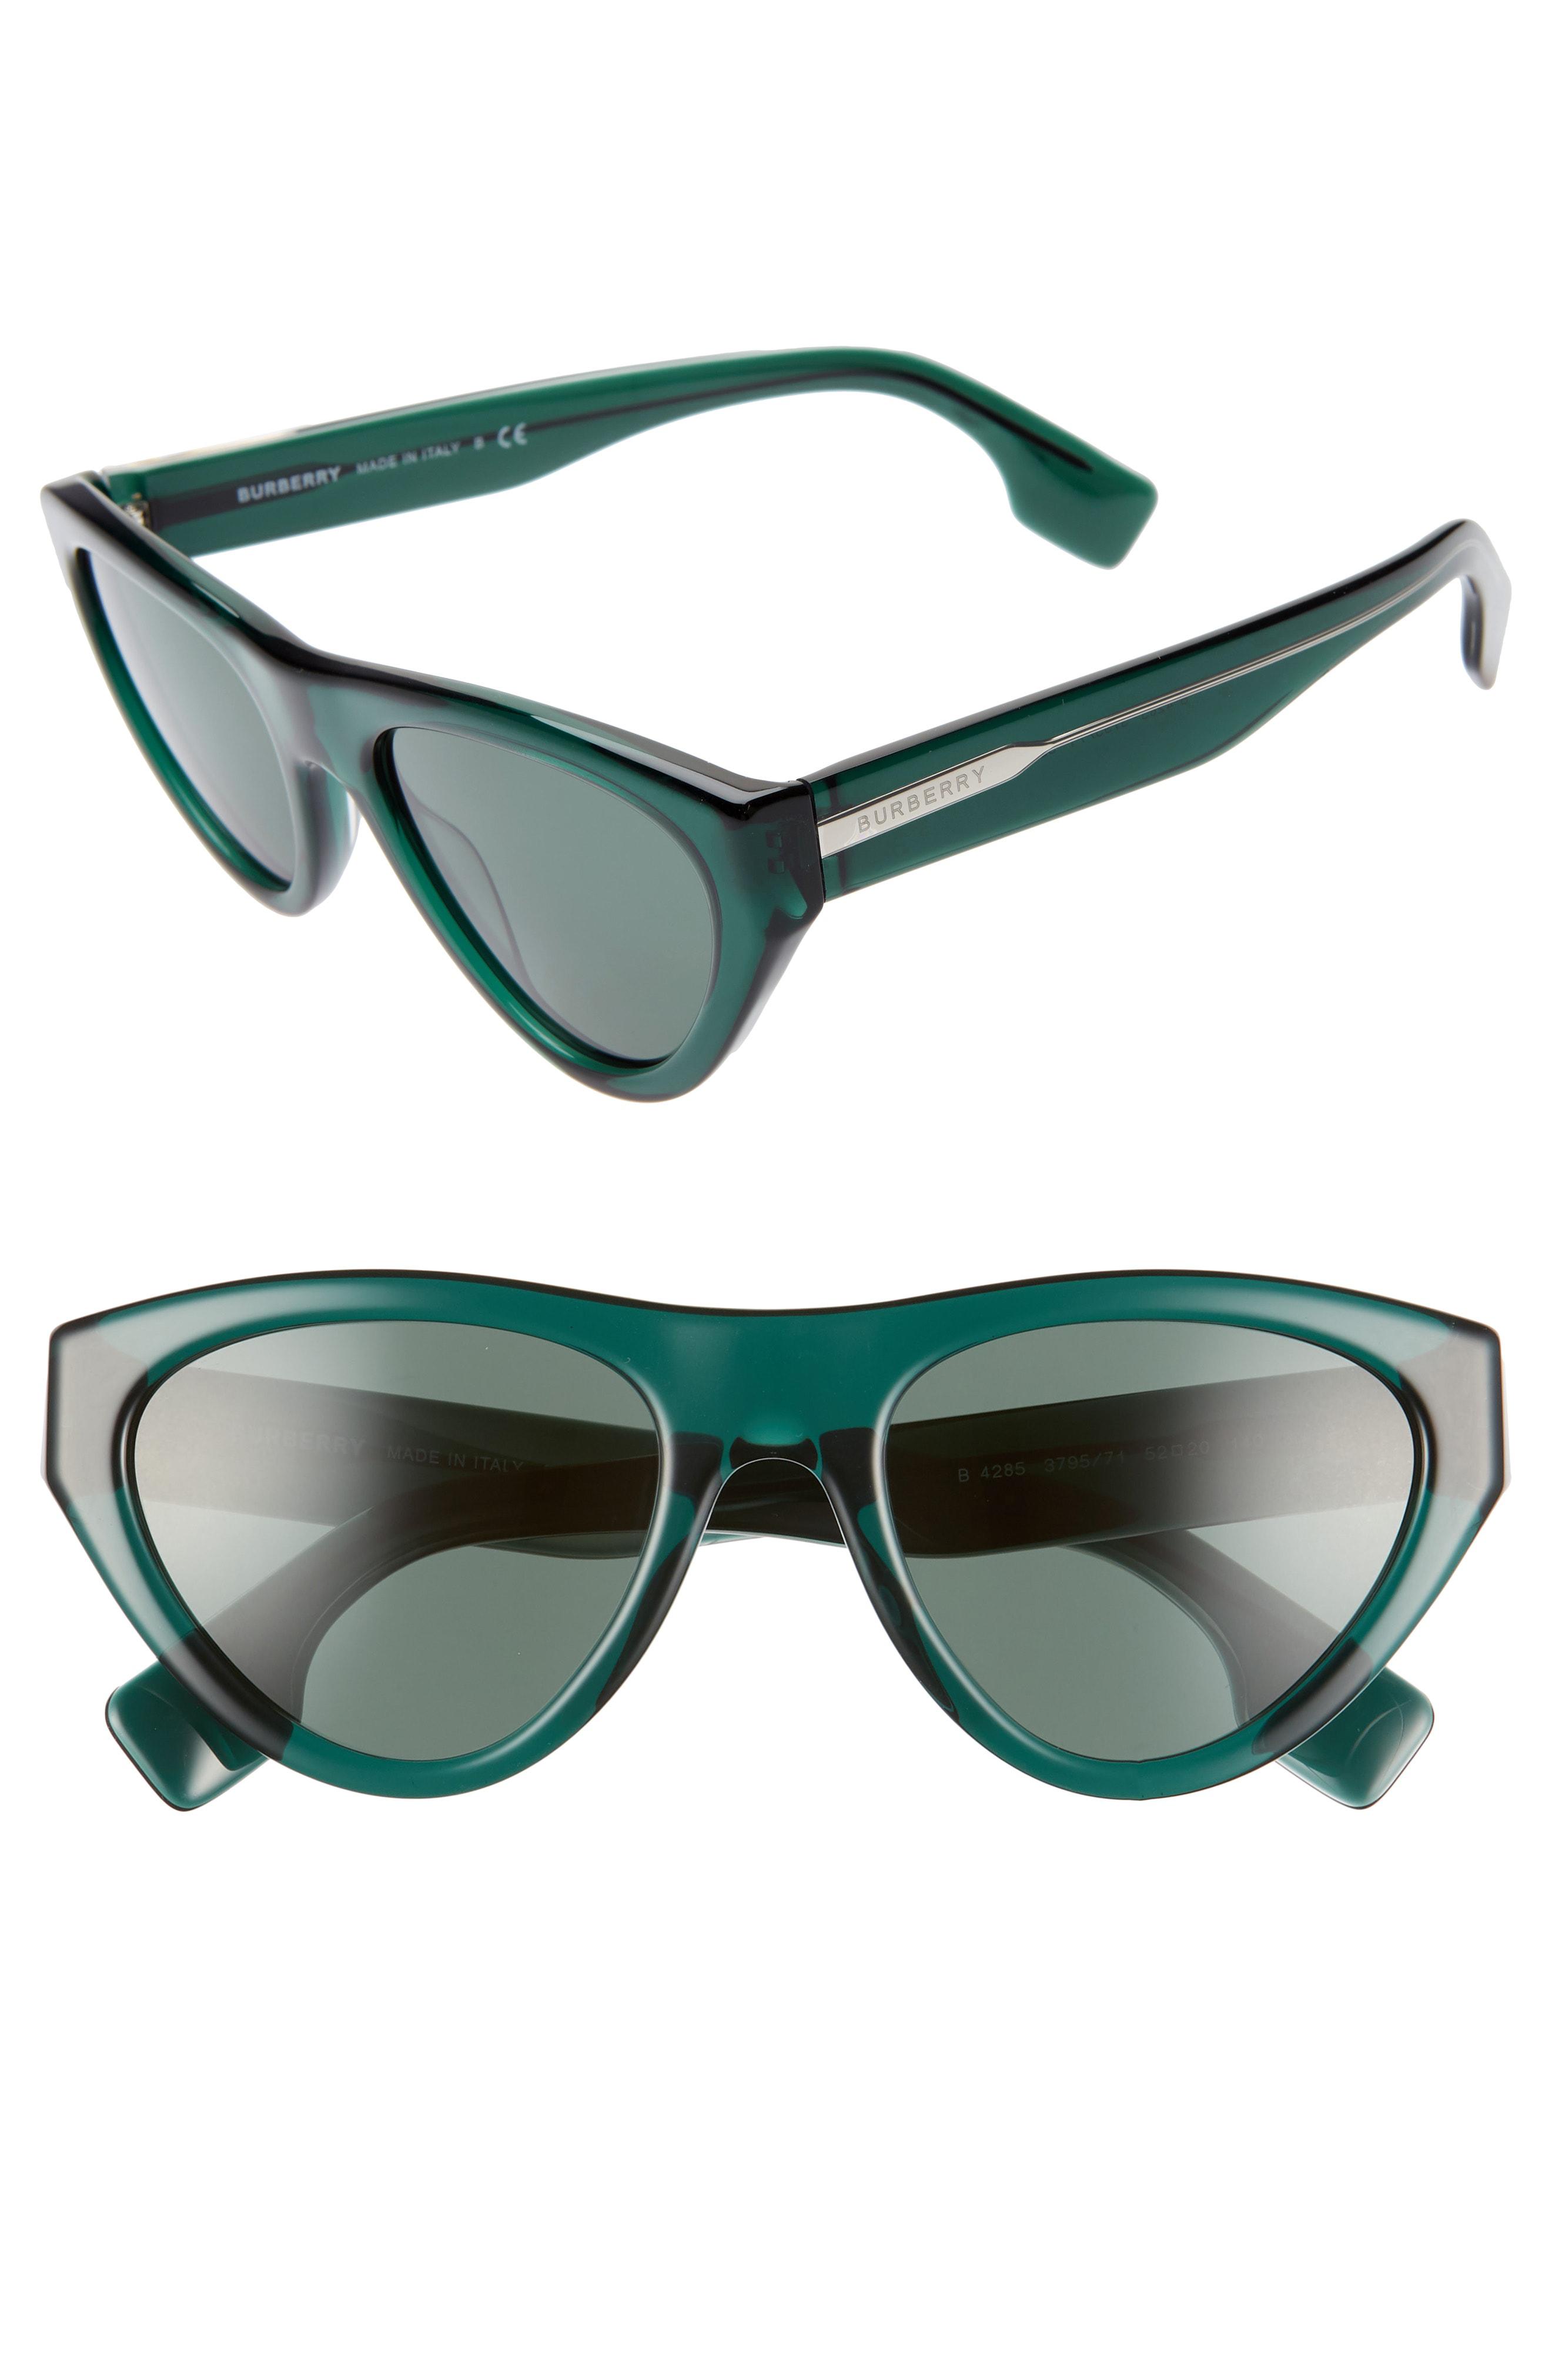 26e192f0db Burberry 52Mm Cat Eye Sunglasses - Transparent Green